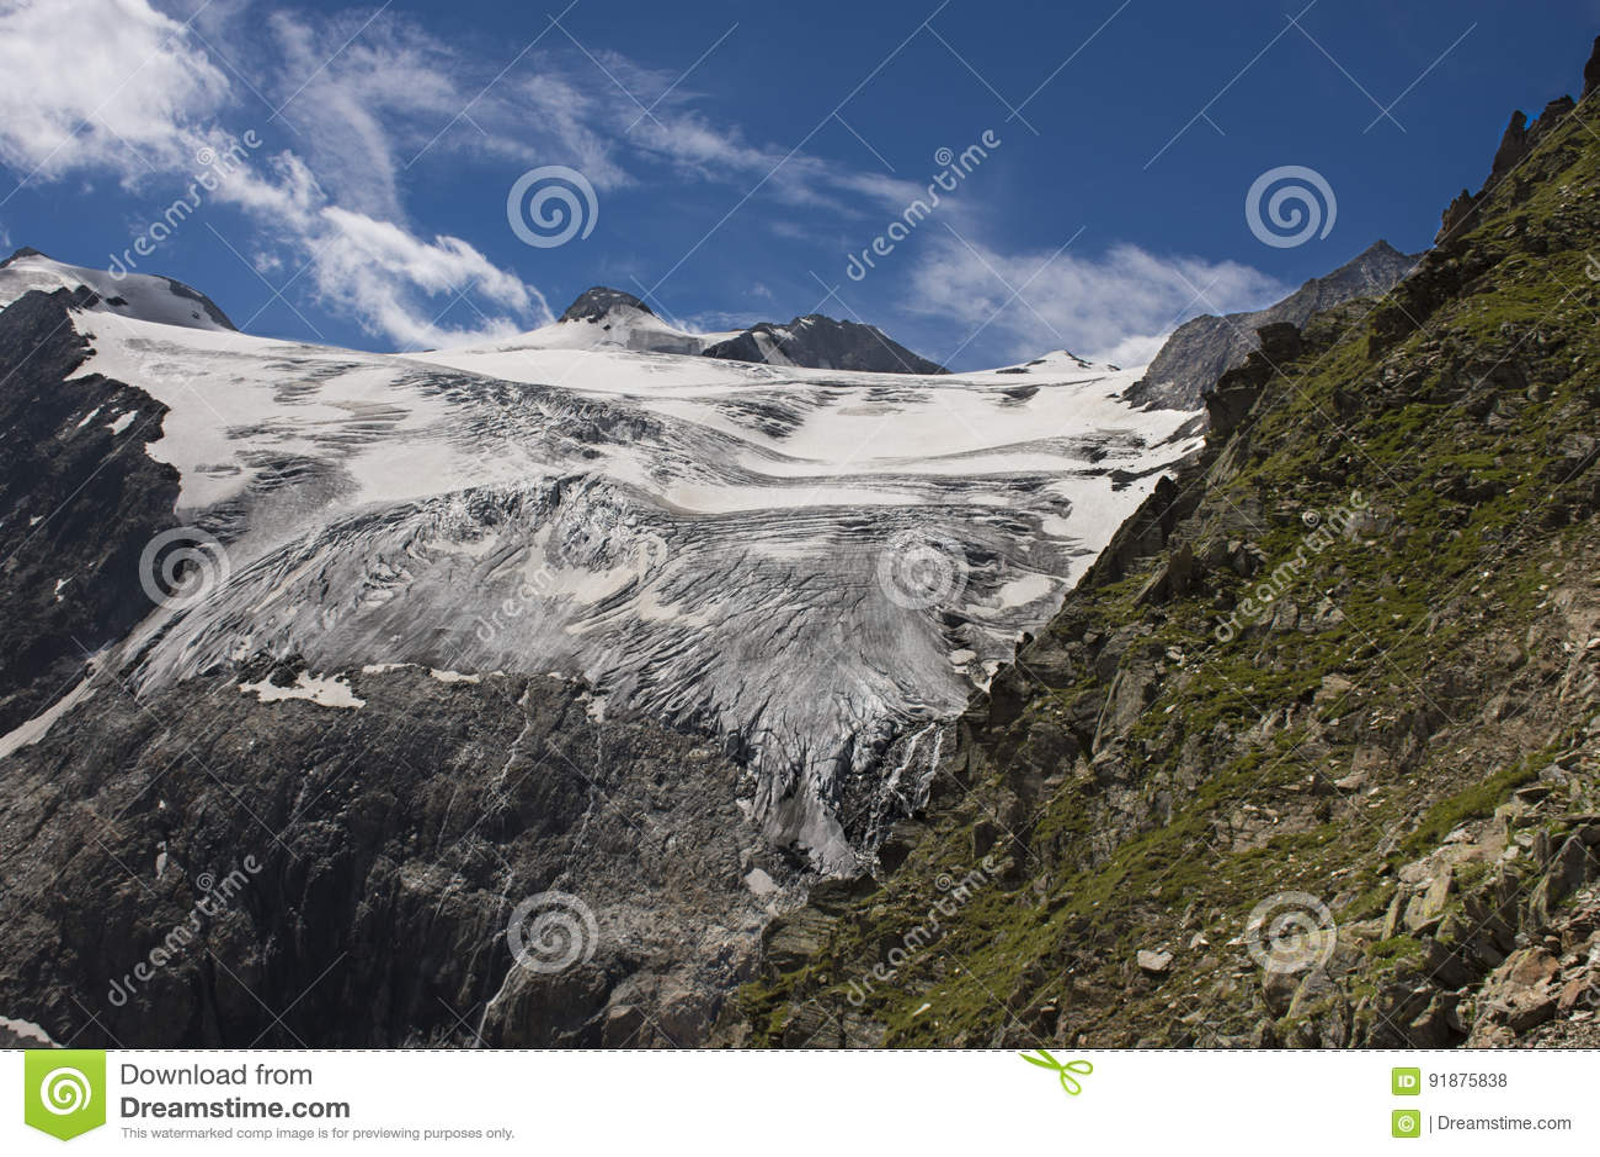 Top of Tyrol • Viewing platform Stubai Glacier